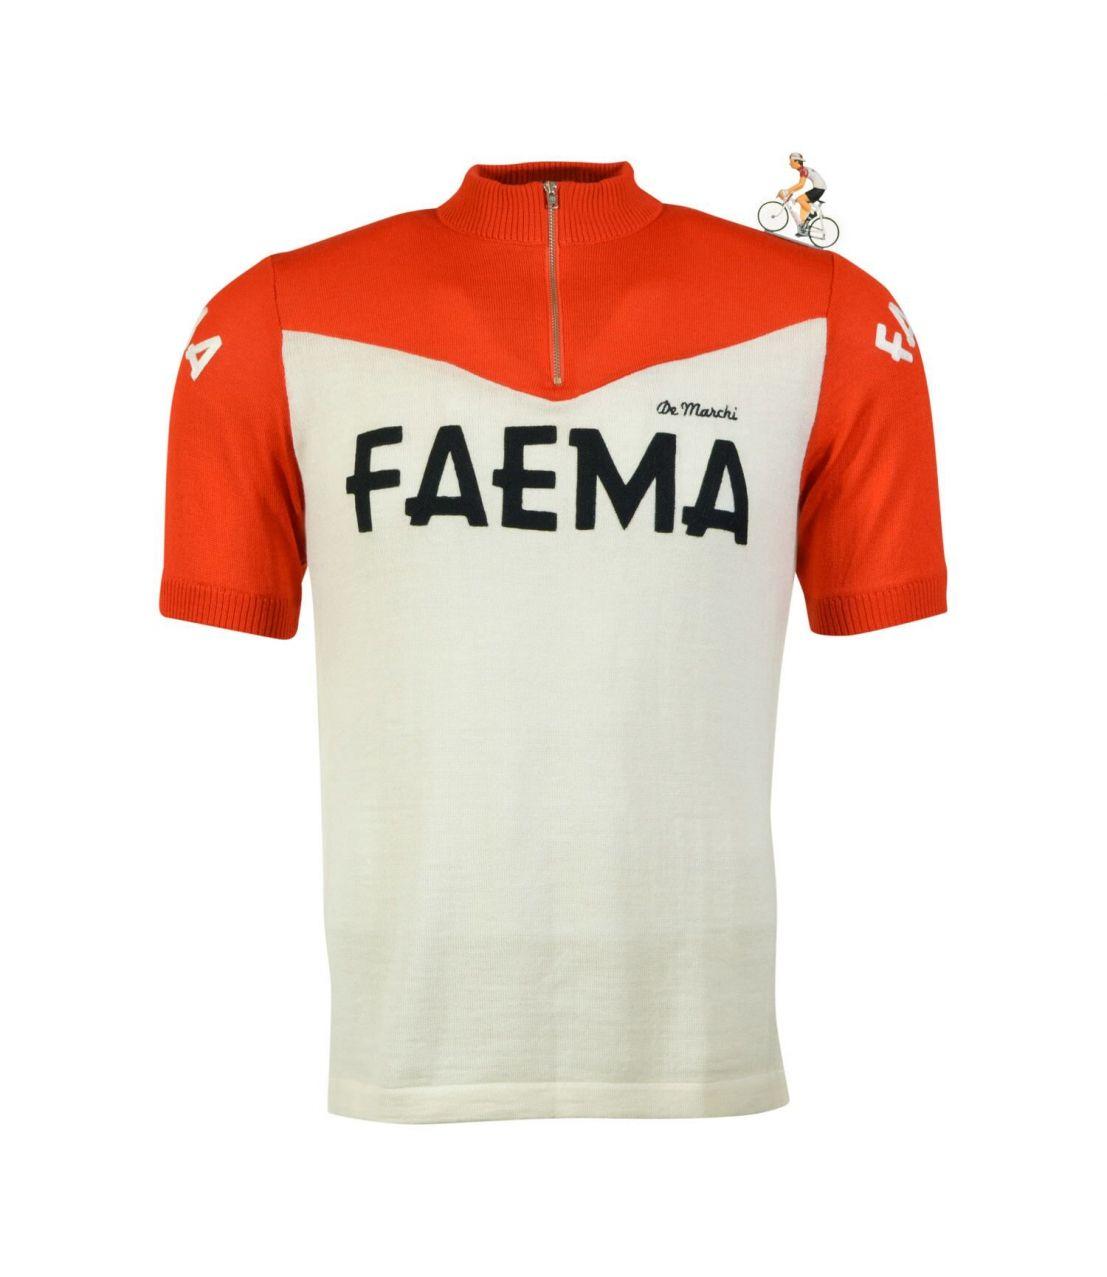 510d9ba69 De Marchi Faema Eddy Merckx Limited Edition Jersey -